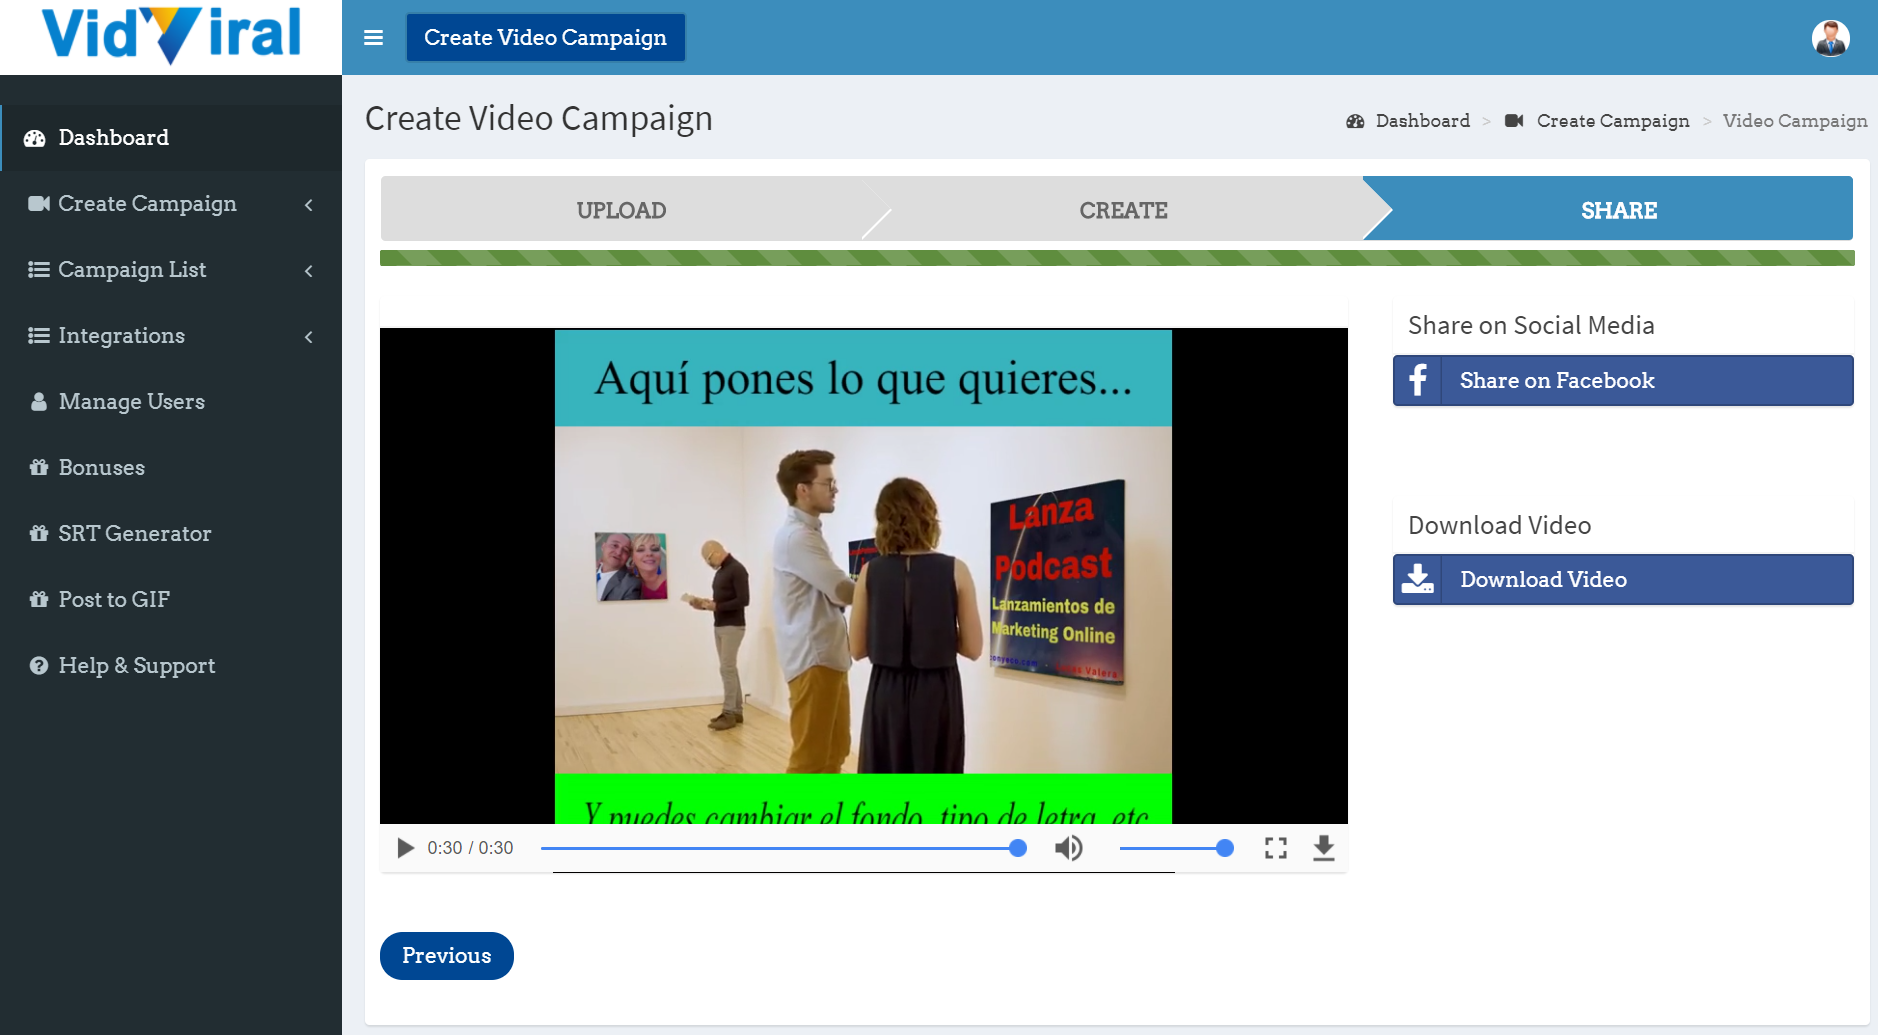 VidViral-Review-Bonuses-conyeco.com-LanzaPodcast-LucasValera-13-Dashboard-VidViral